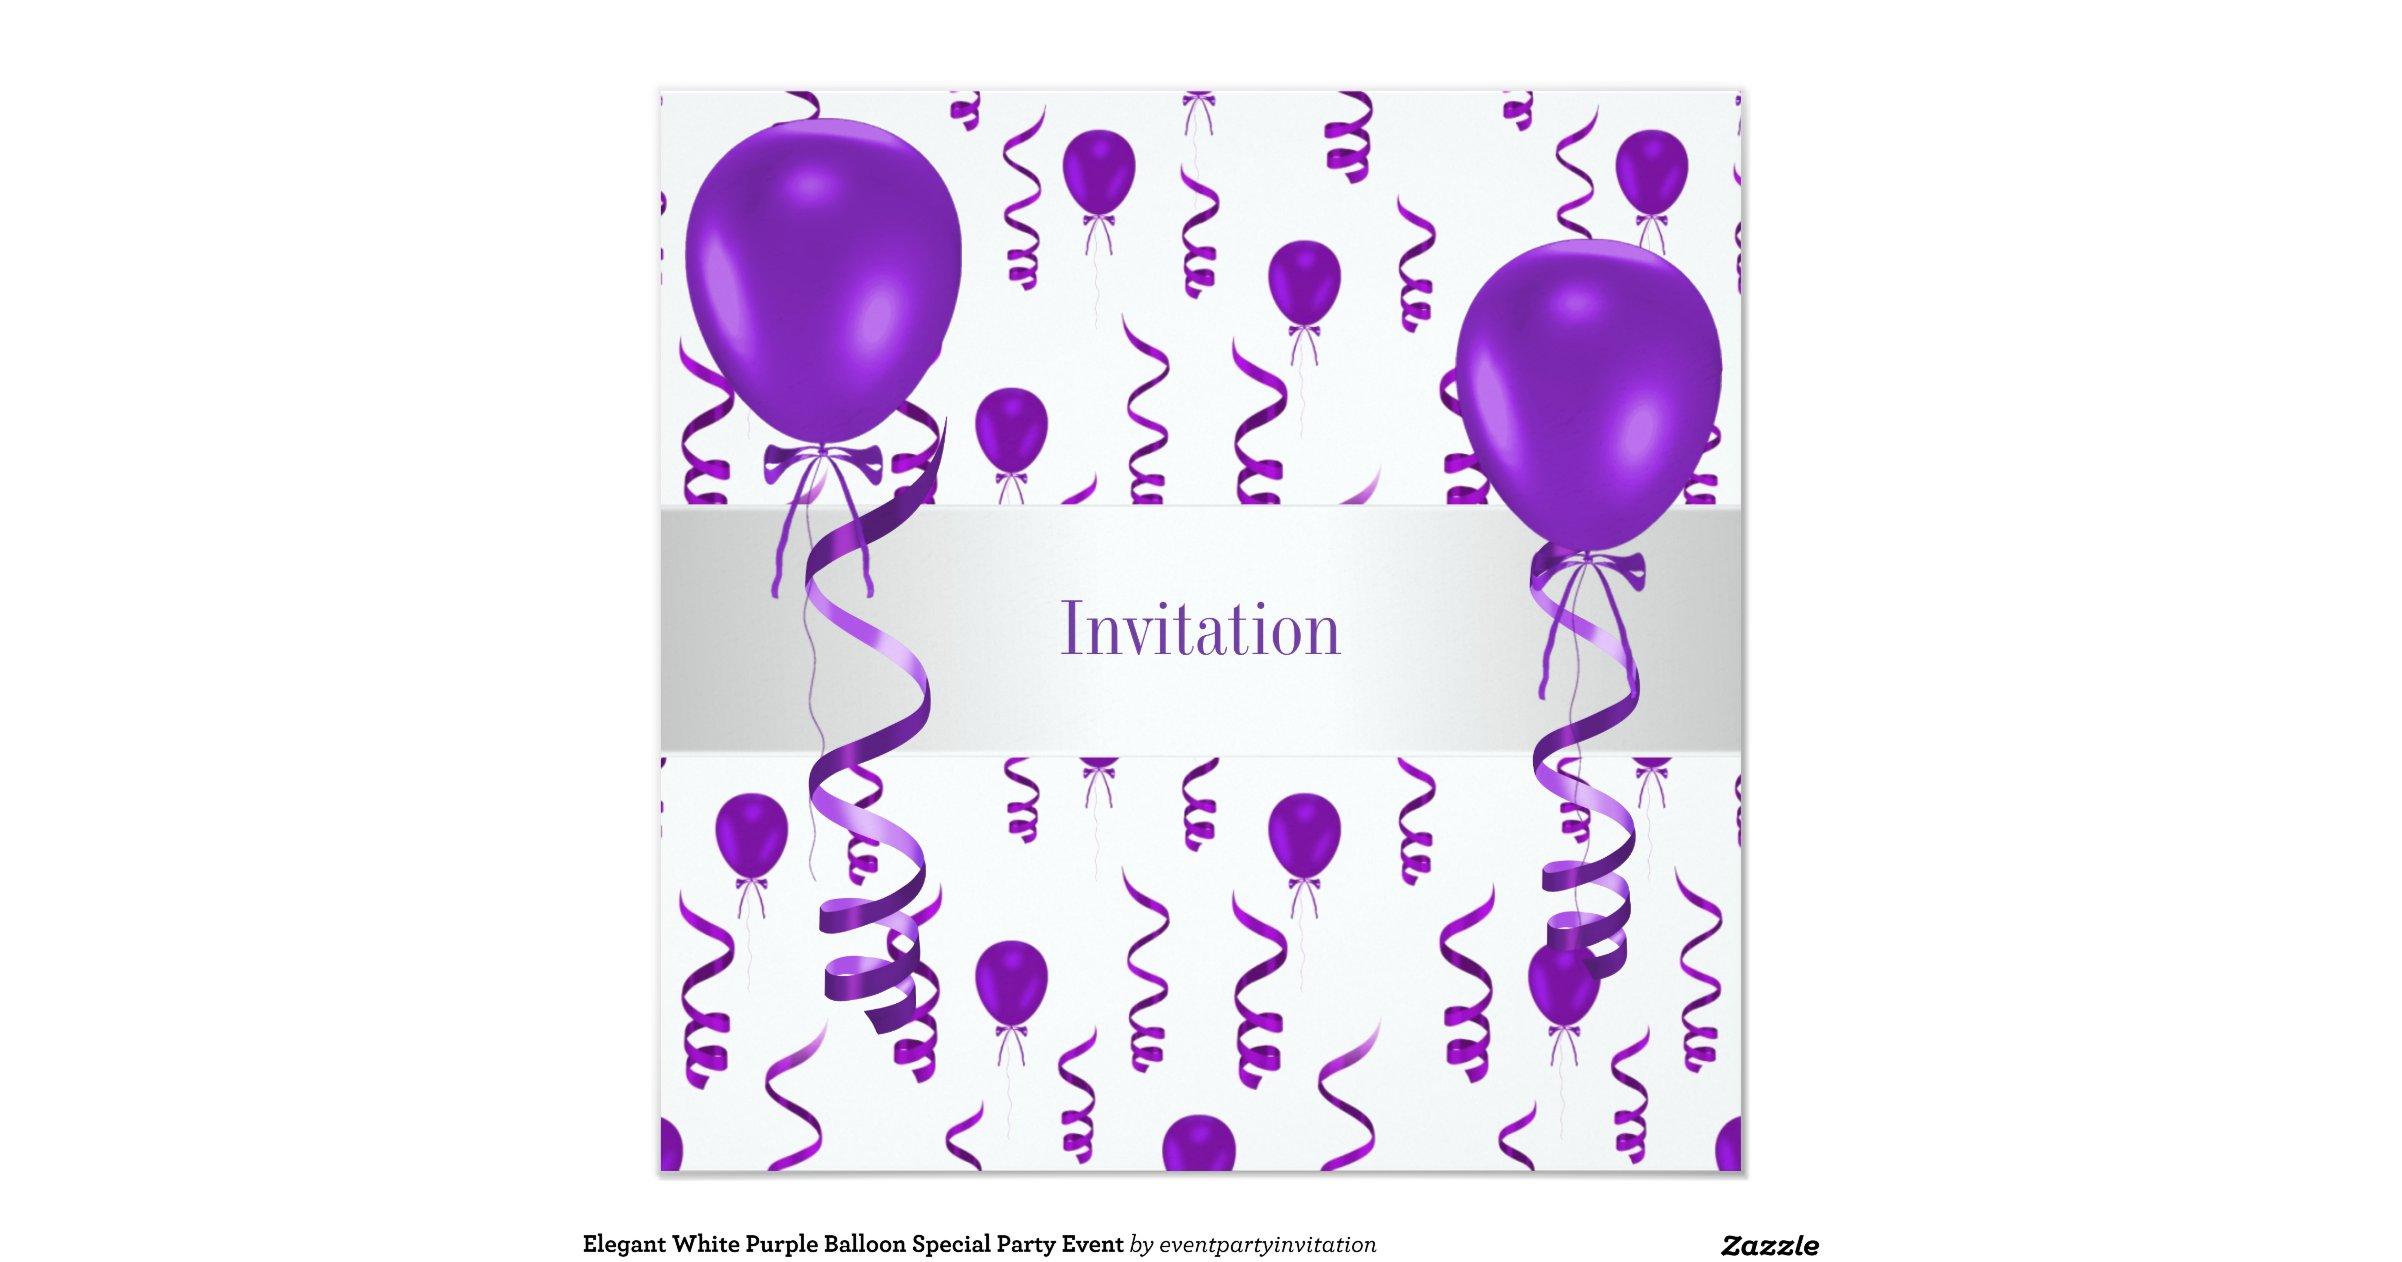 elegant_white_purple_balloon_special_party_event ... - photo#11